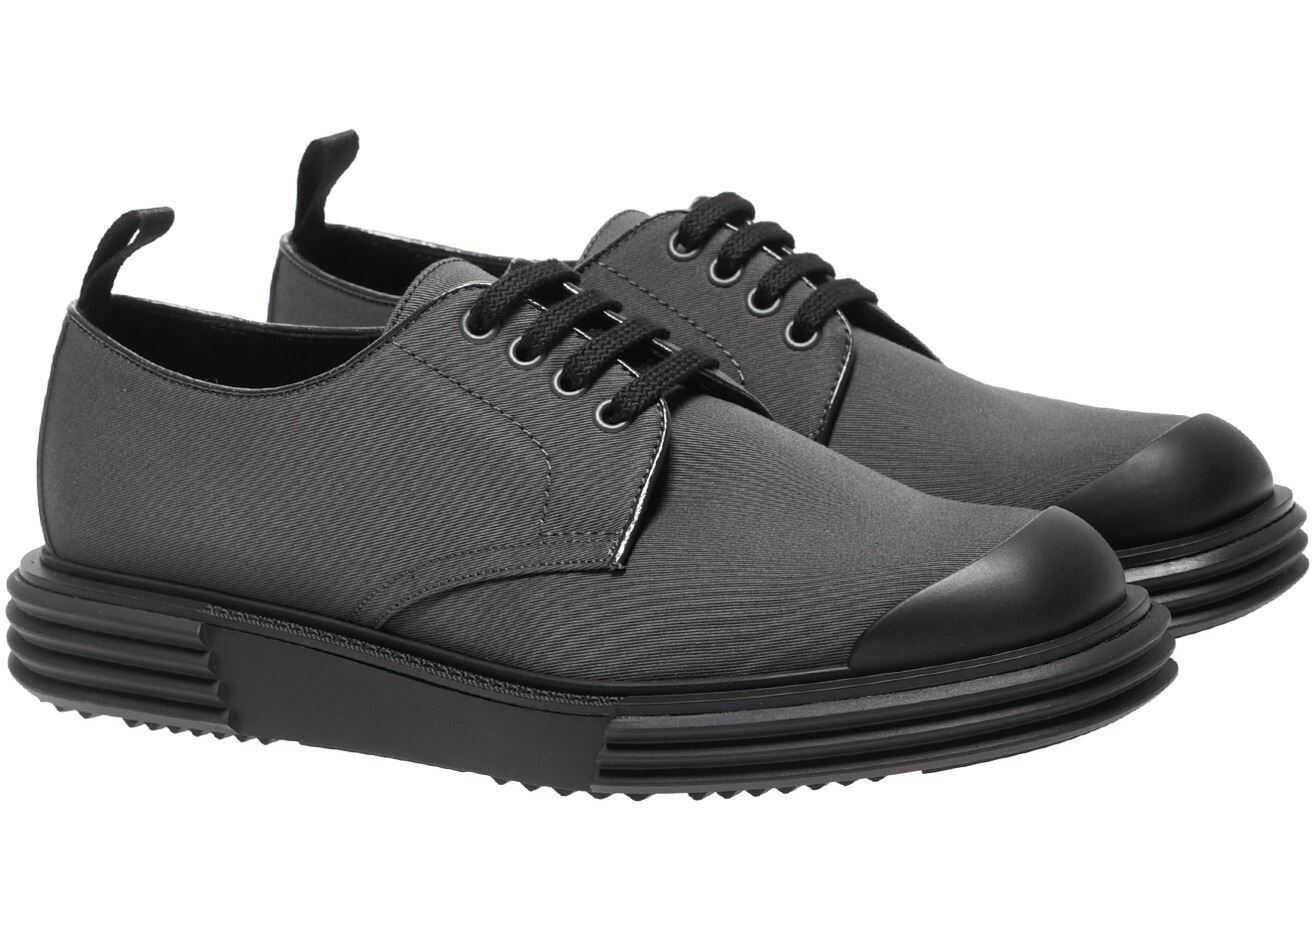 Prada Prada Dark Grey Fabric Shoes 2EE286 GUD F0170 Grey imagine b-mall.ro